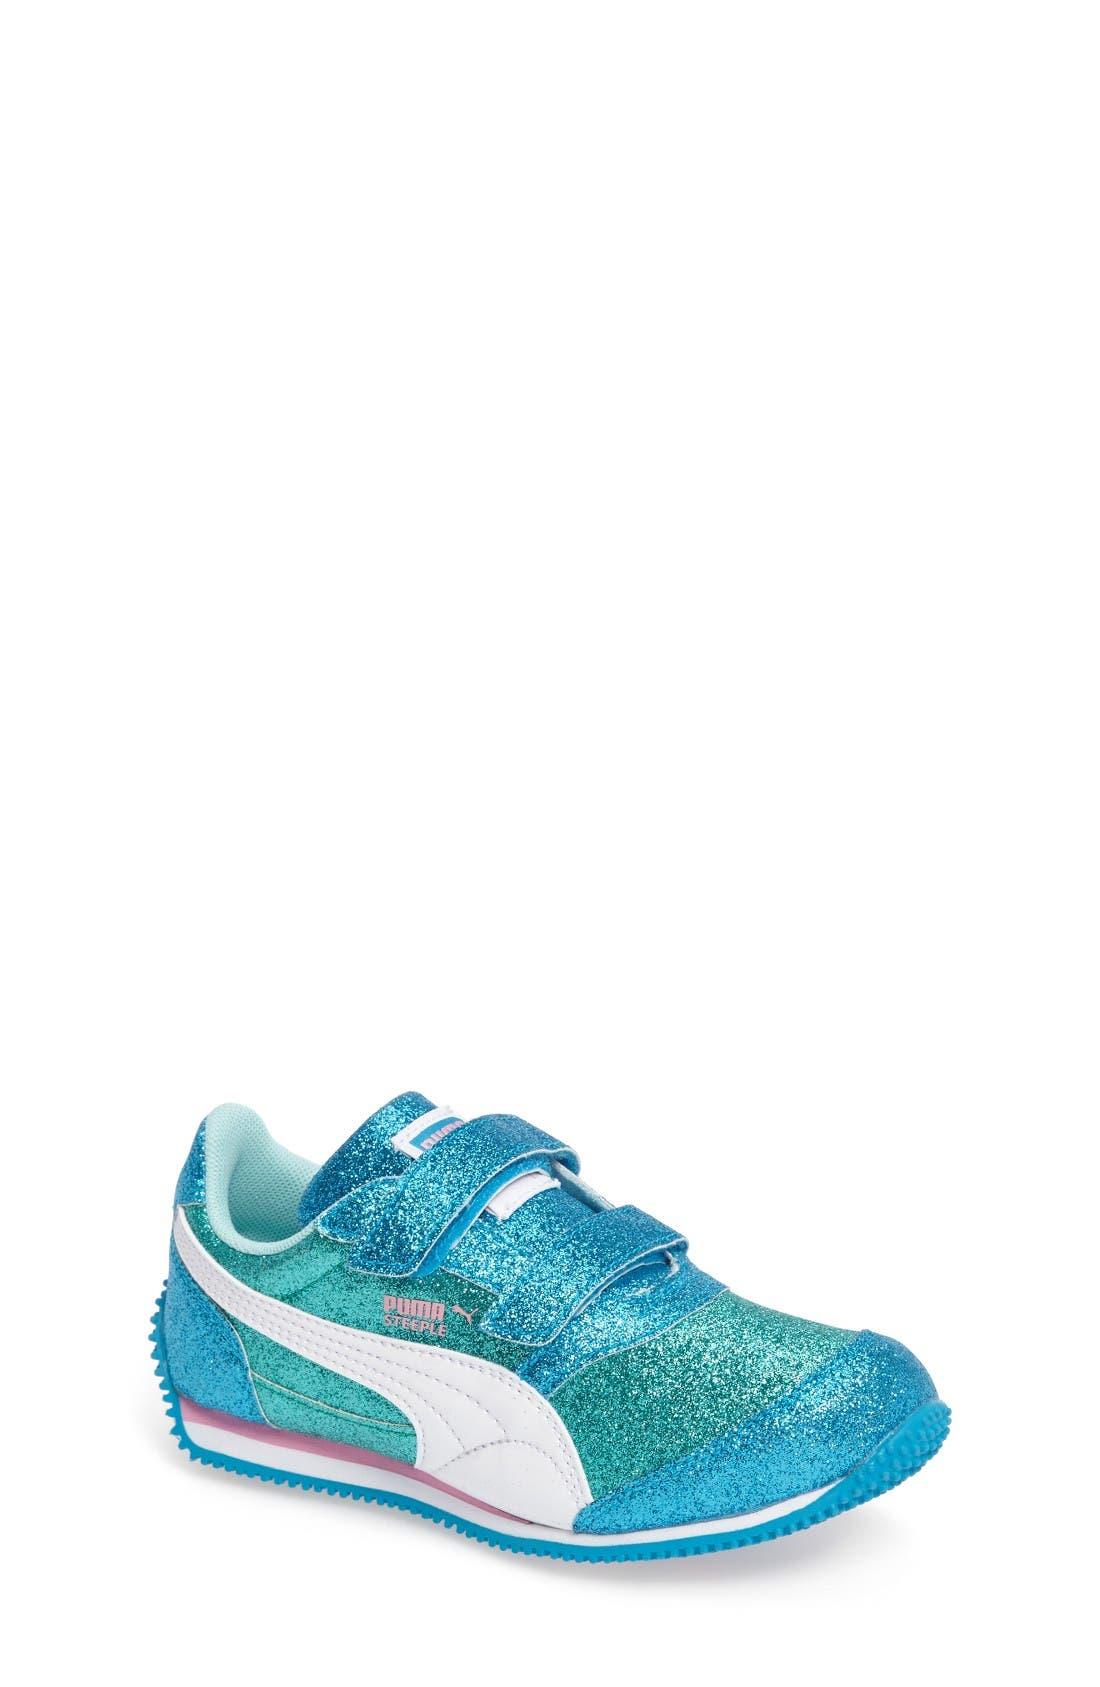 Main Image - PUMA Steeple Glitz Glam Sneaker (Baby, Walker, Toddler, Little Kid & Big Kid)